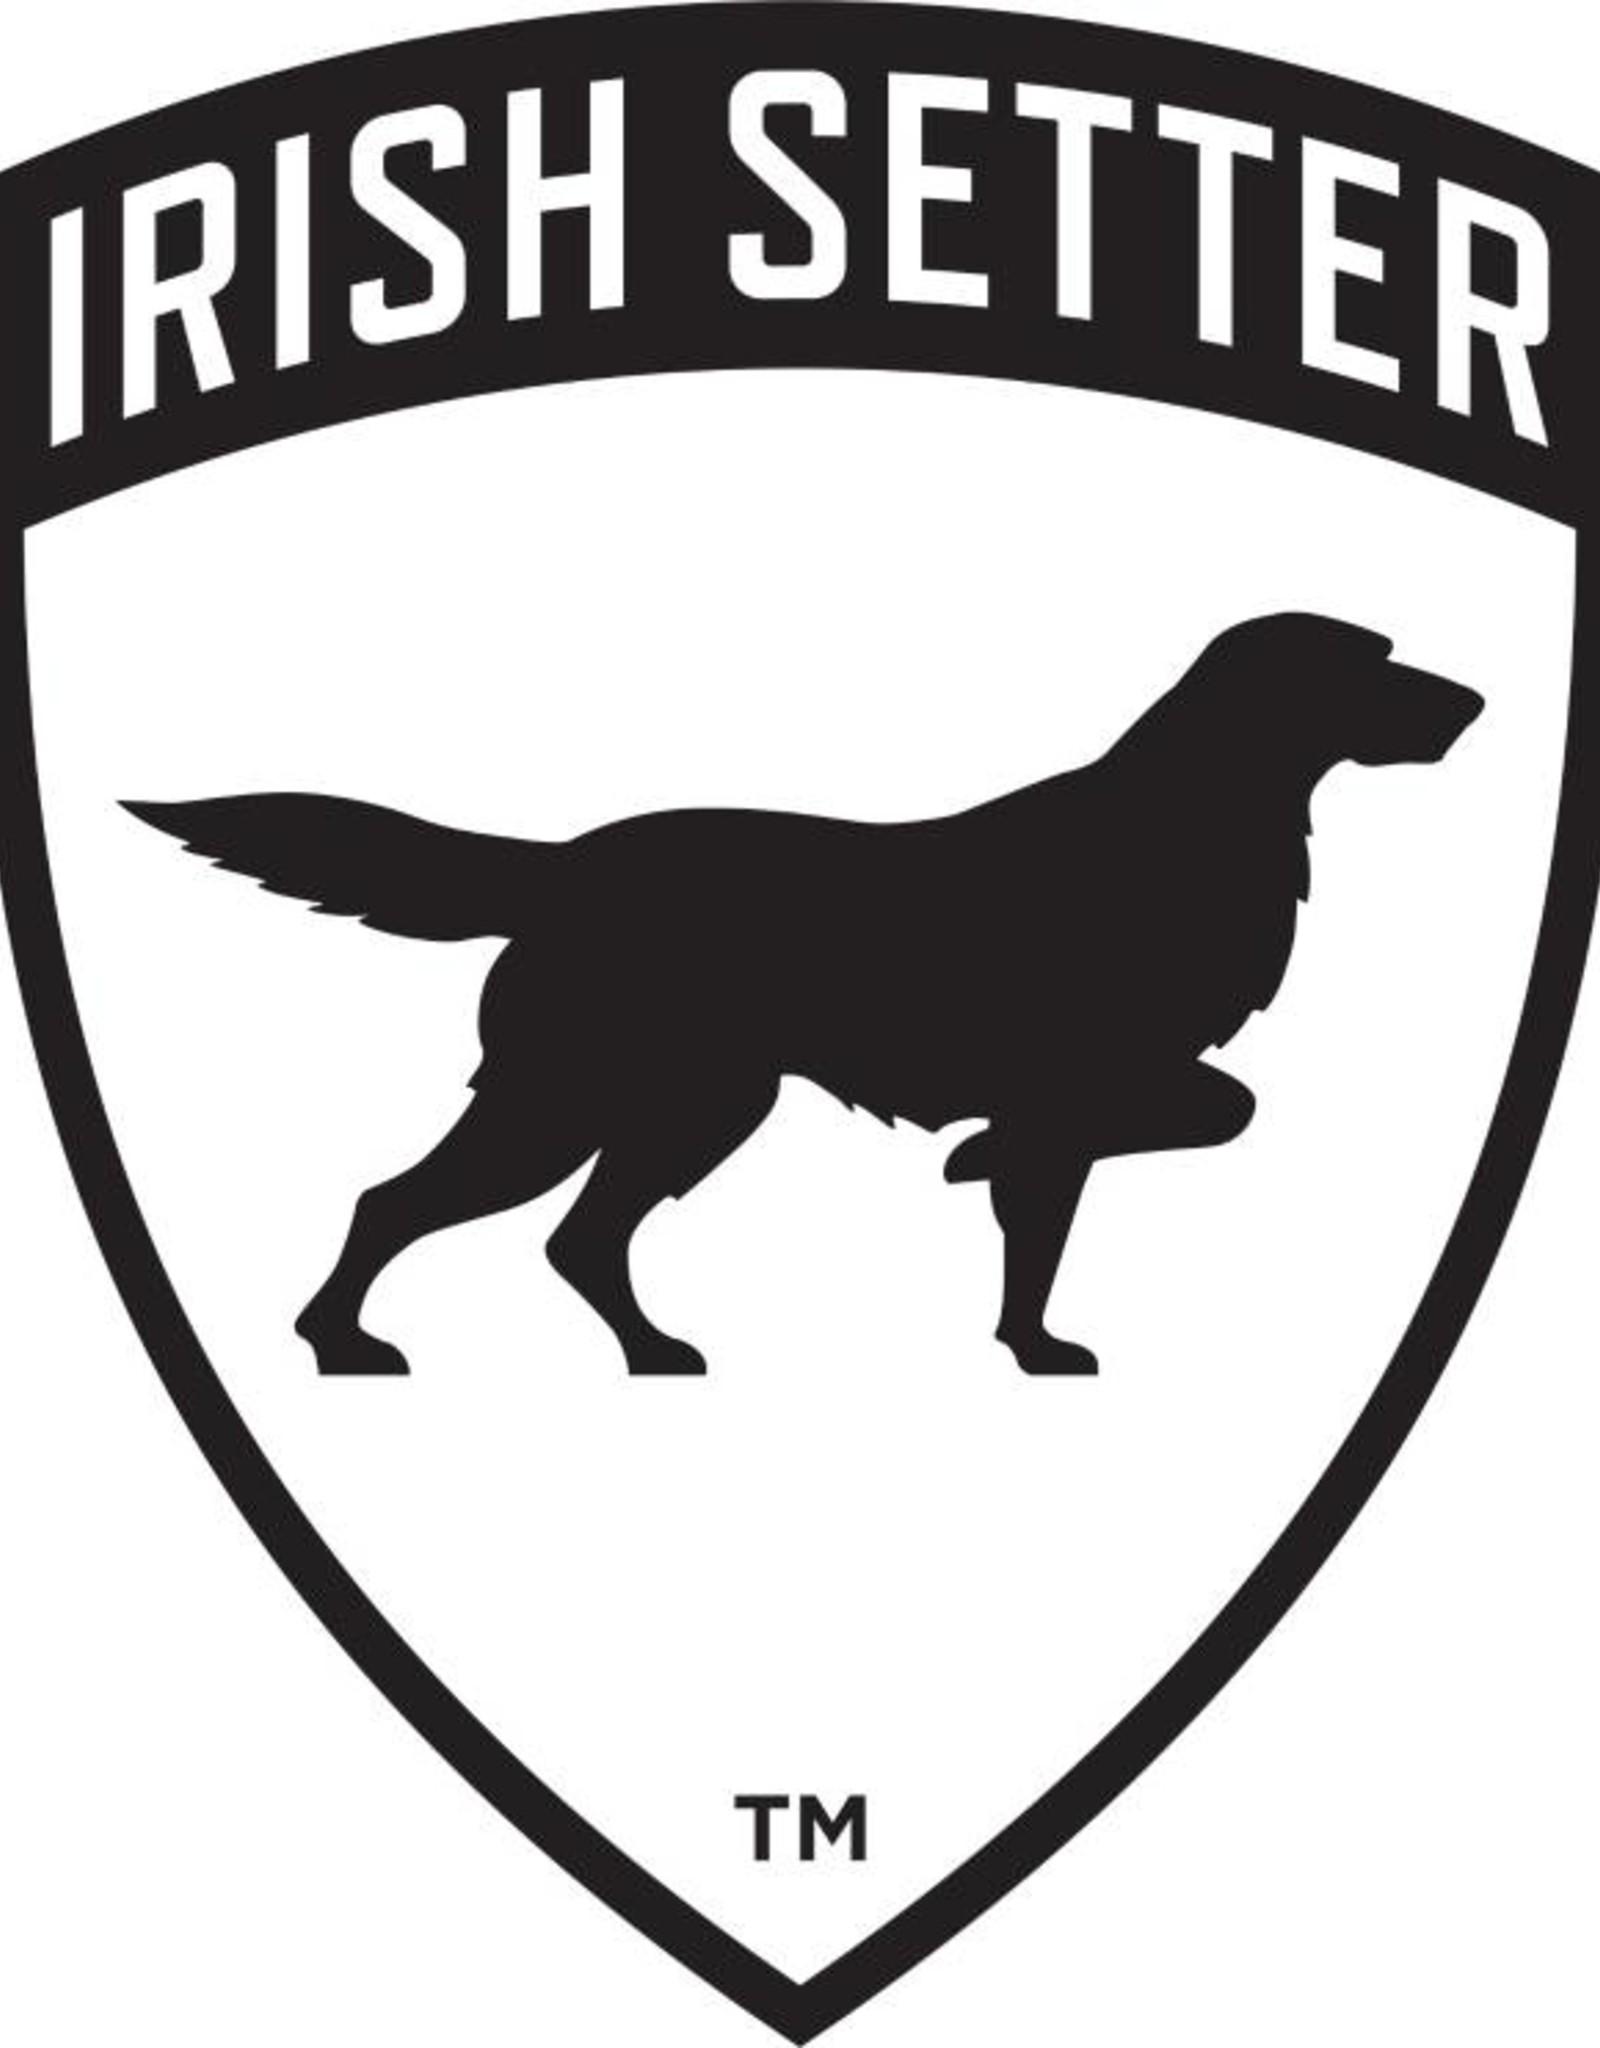 Redwing Irish Setter Elk Tracker 861